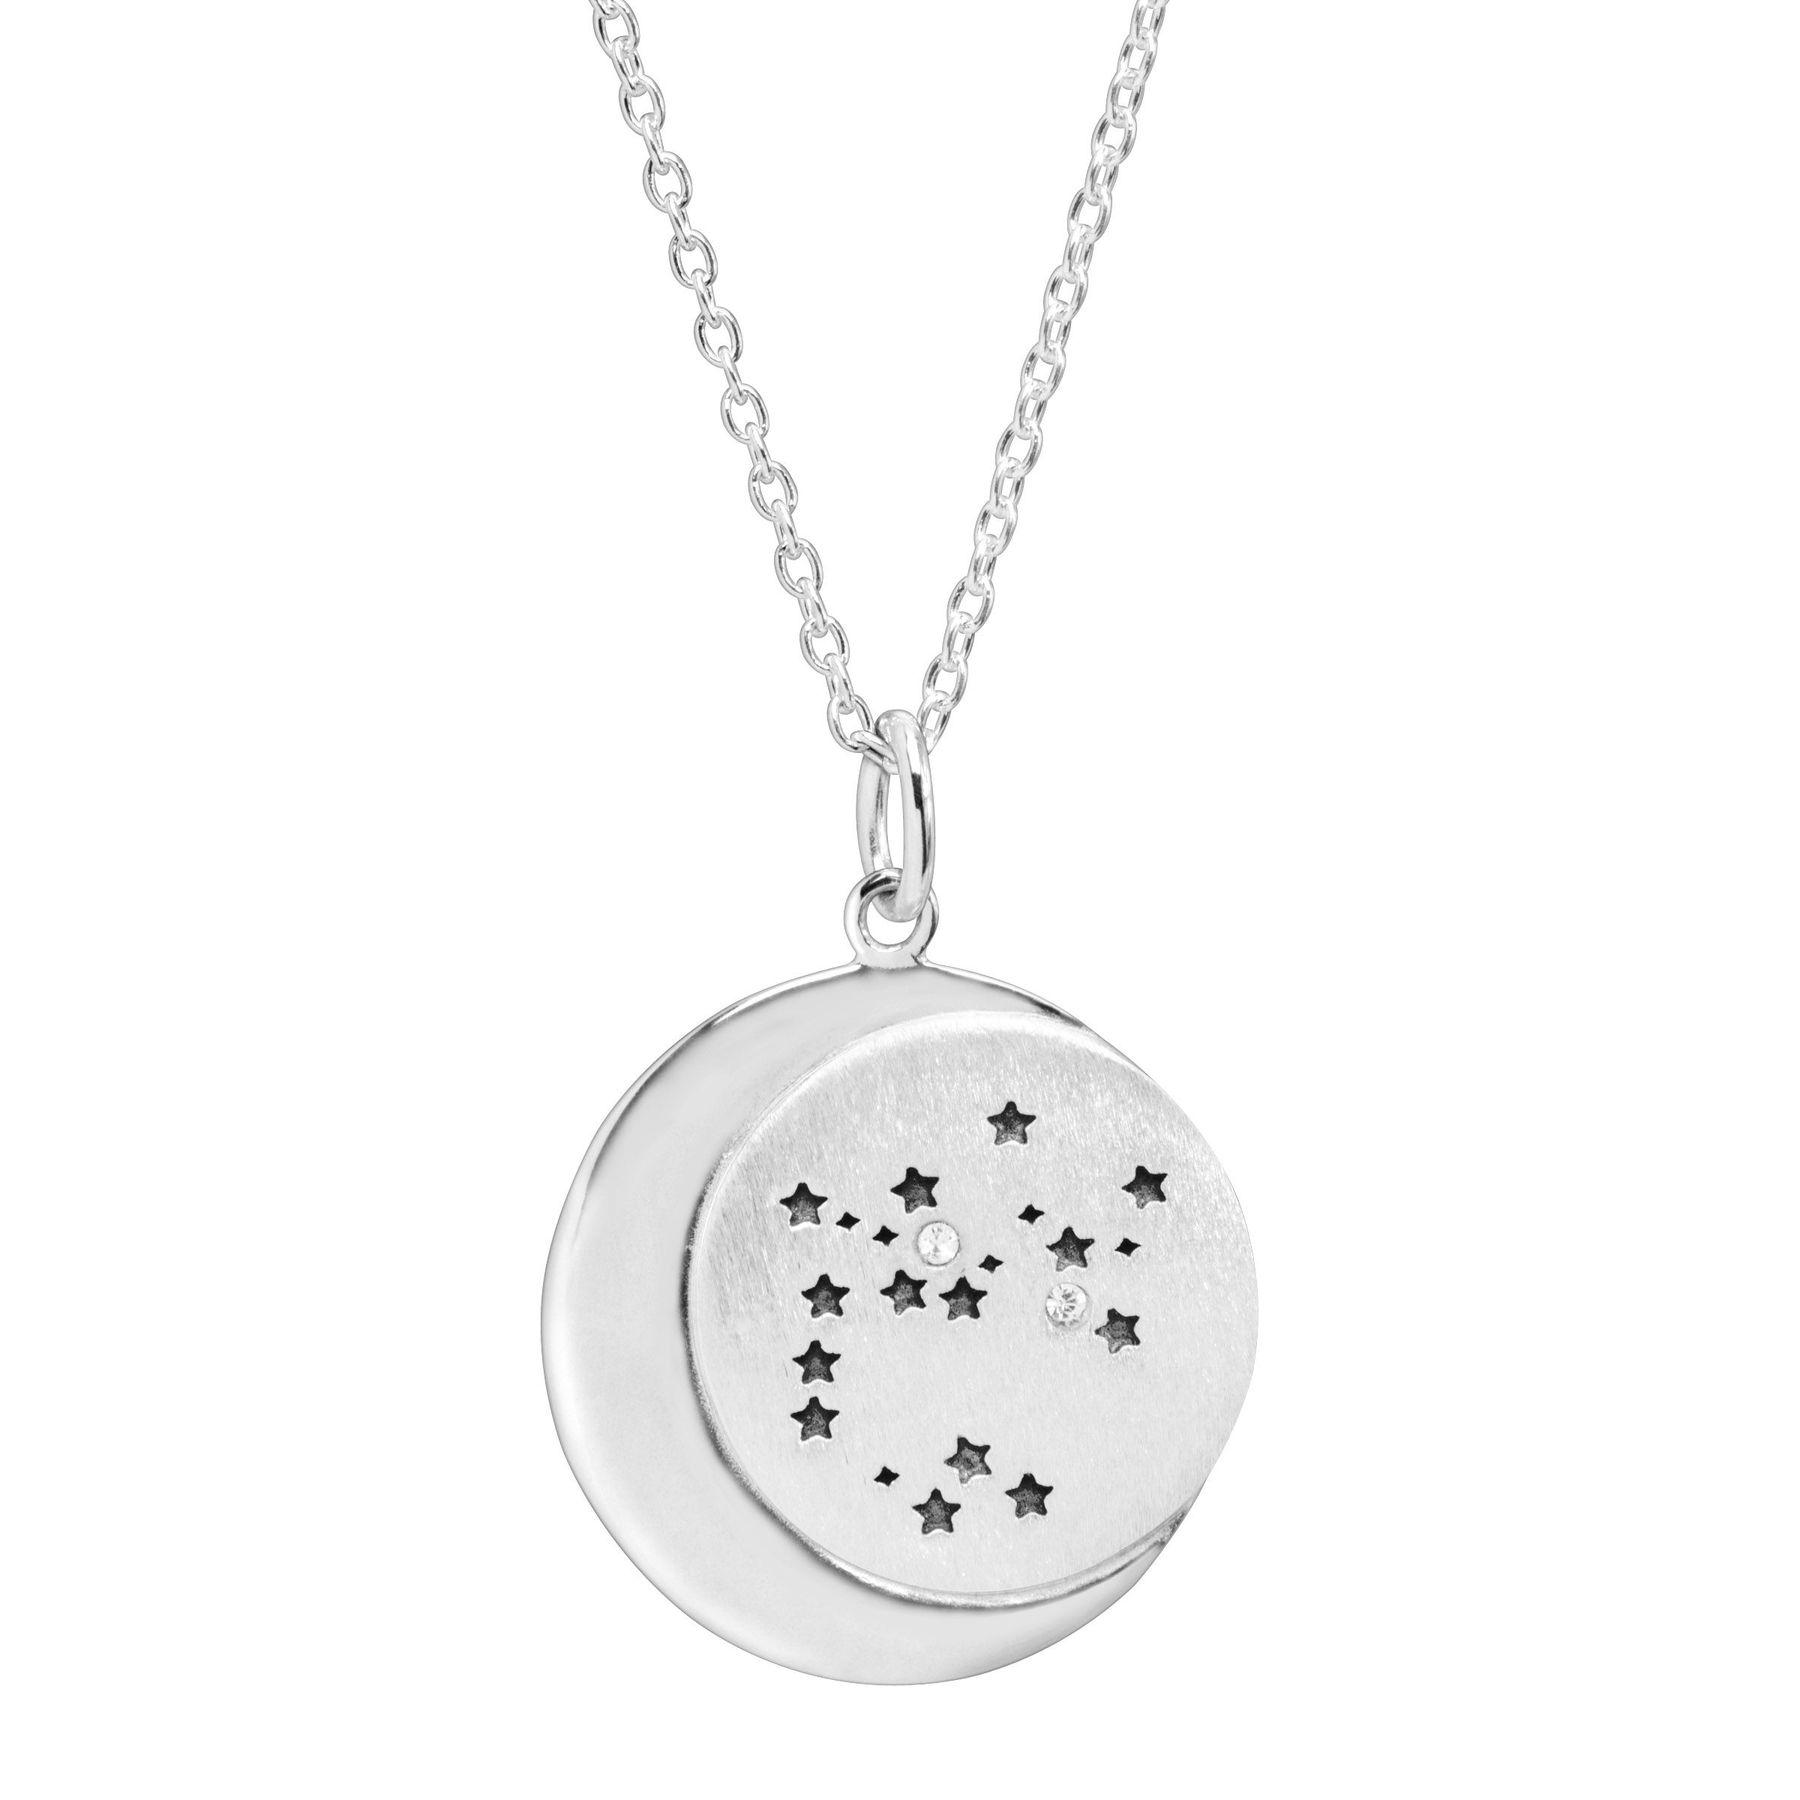 Silpada 'Sagittarius' Constellation Pendant with White Swarovski Crystals  in Sterling Silver, 18